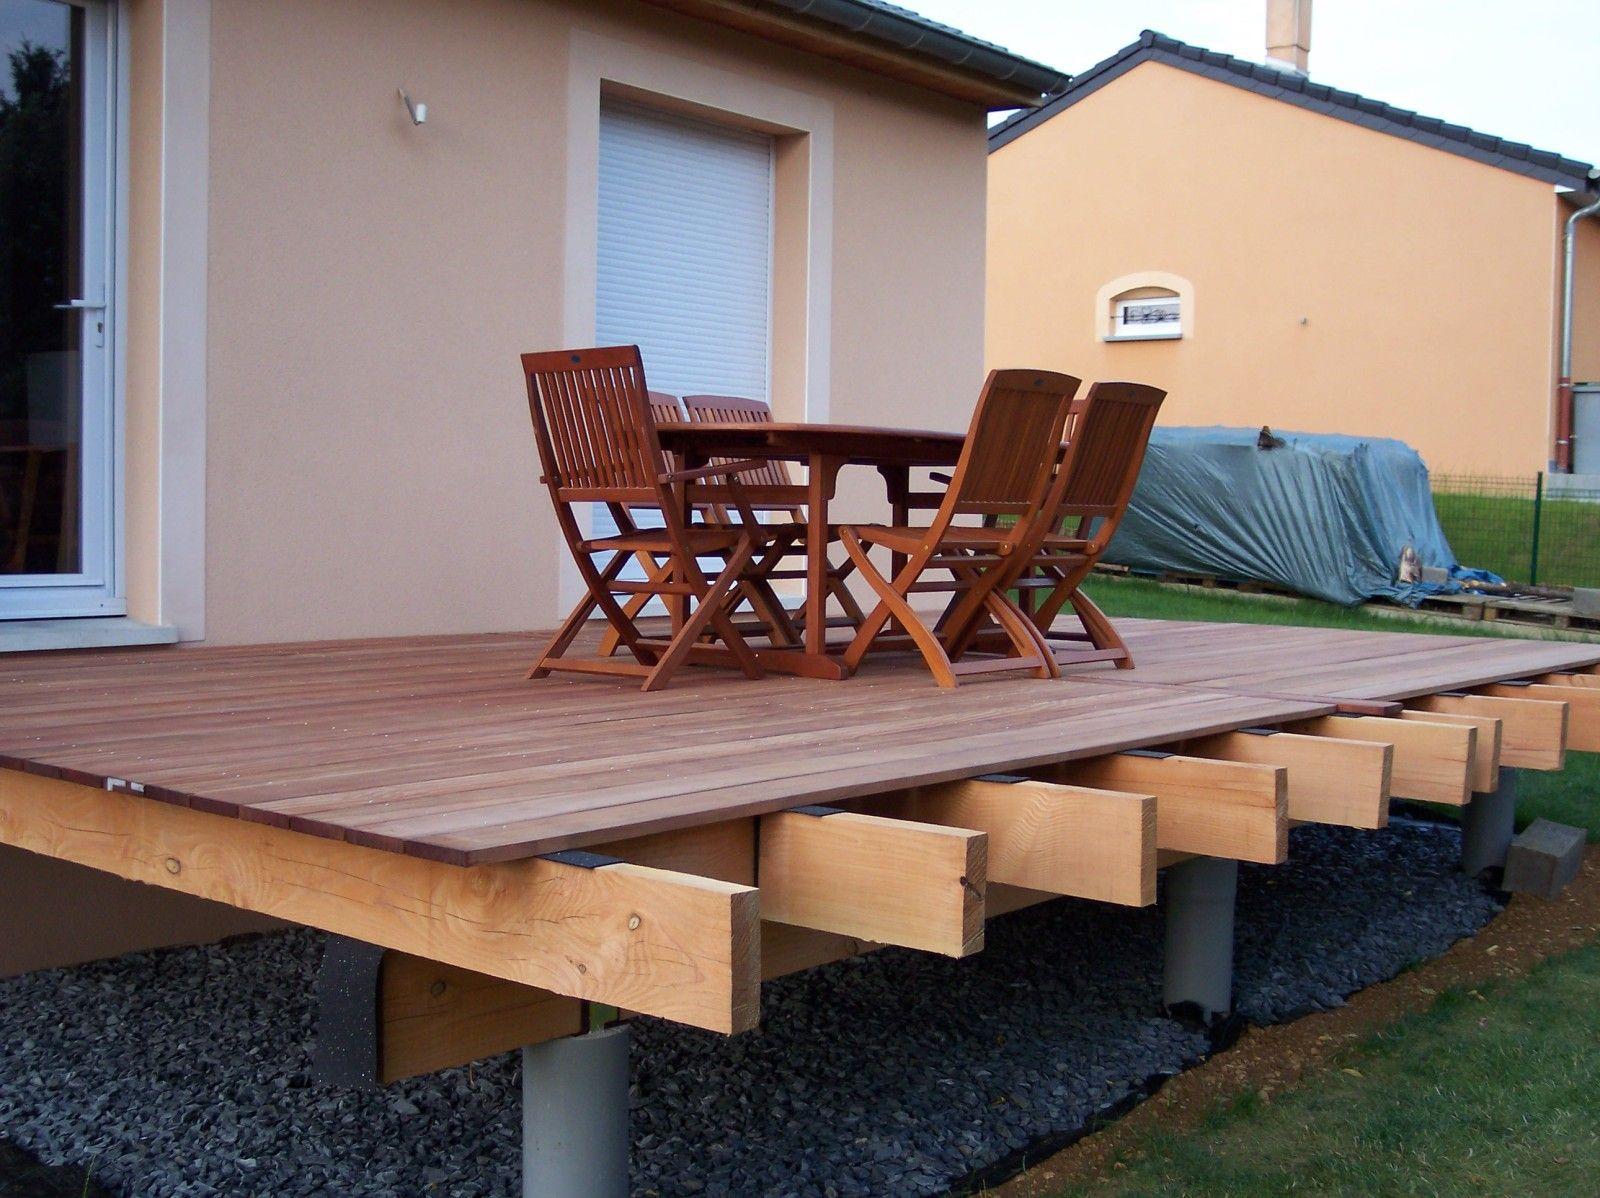 Construire Une Terrasse En Bois Surelevee album photo | construire terrasse bois, terrasse bois, patio